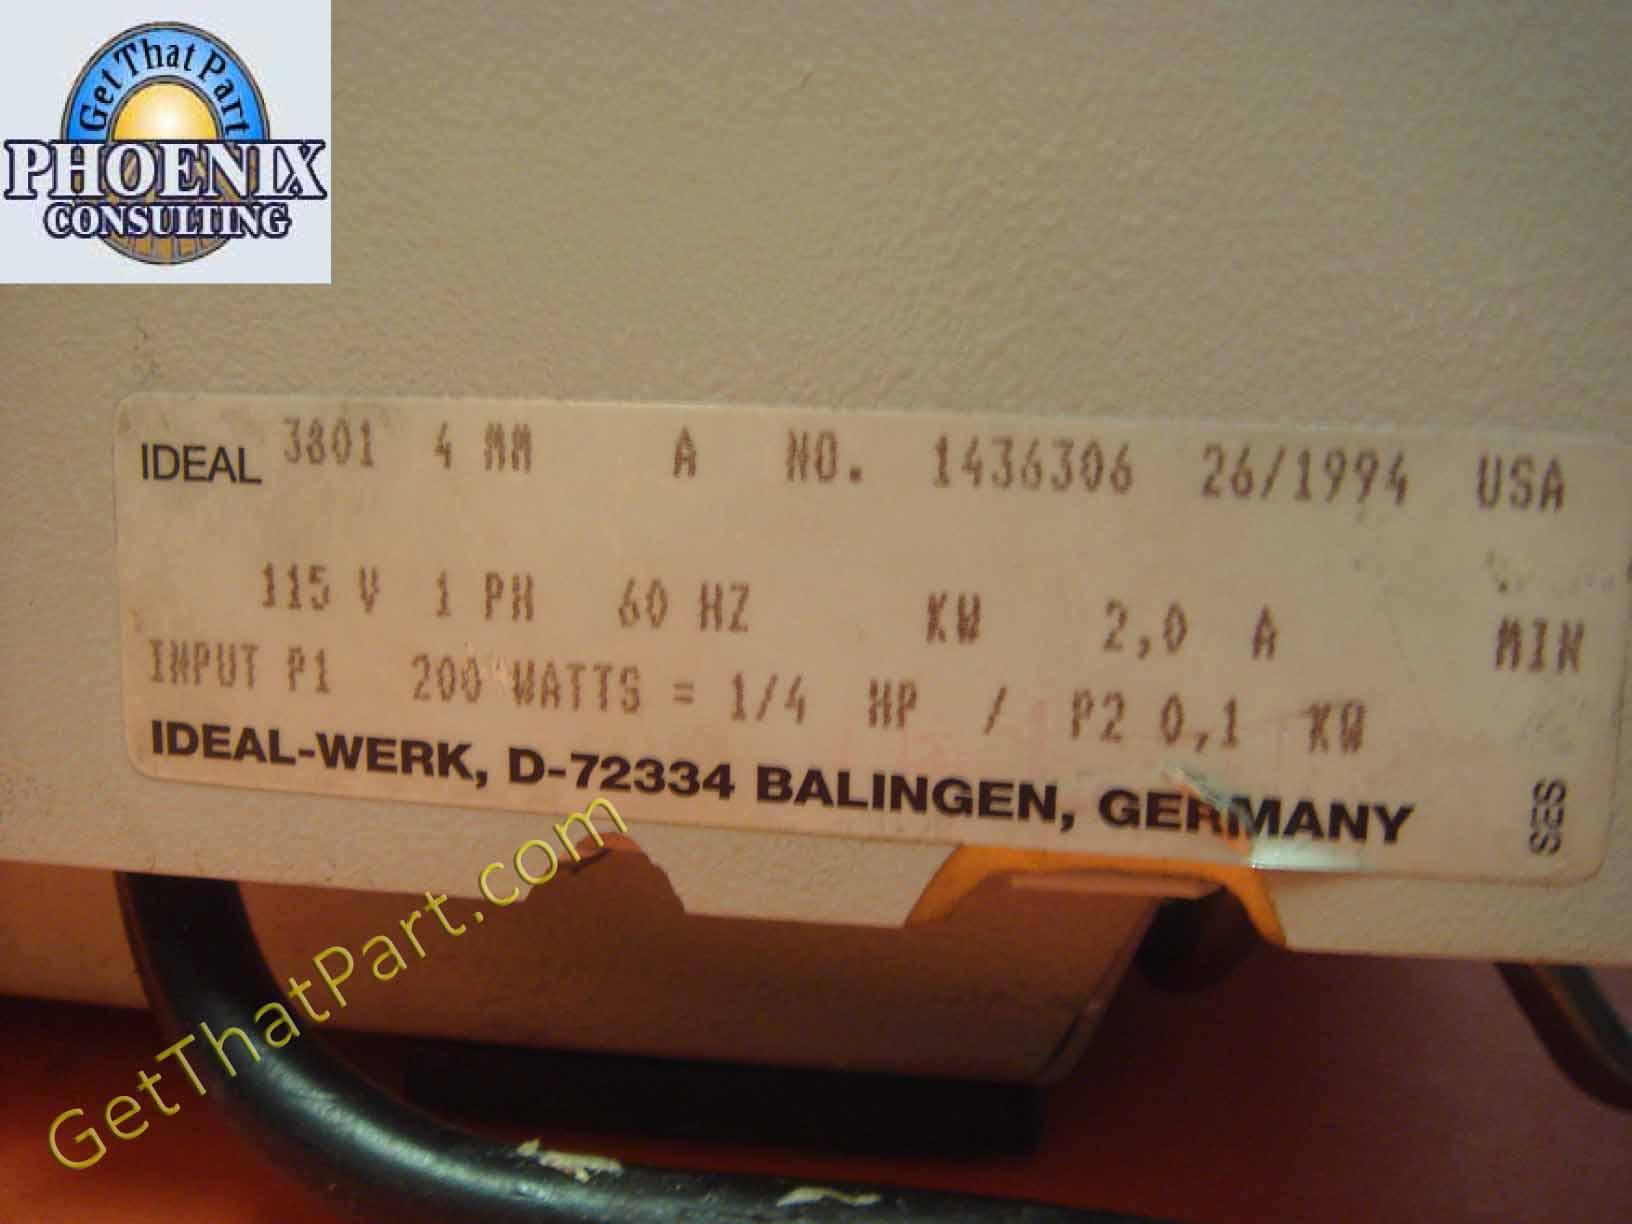 4 Wire Paper Shredder Motor Wiring Diagram 42 Germany Diagrams Ideal Destroyit 3801 Stripcut German M Gear Industrial